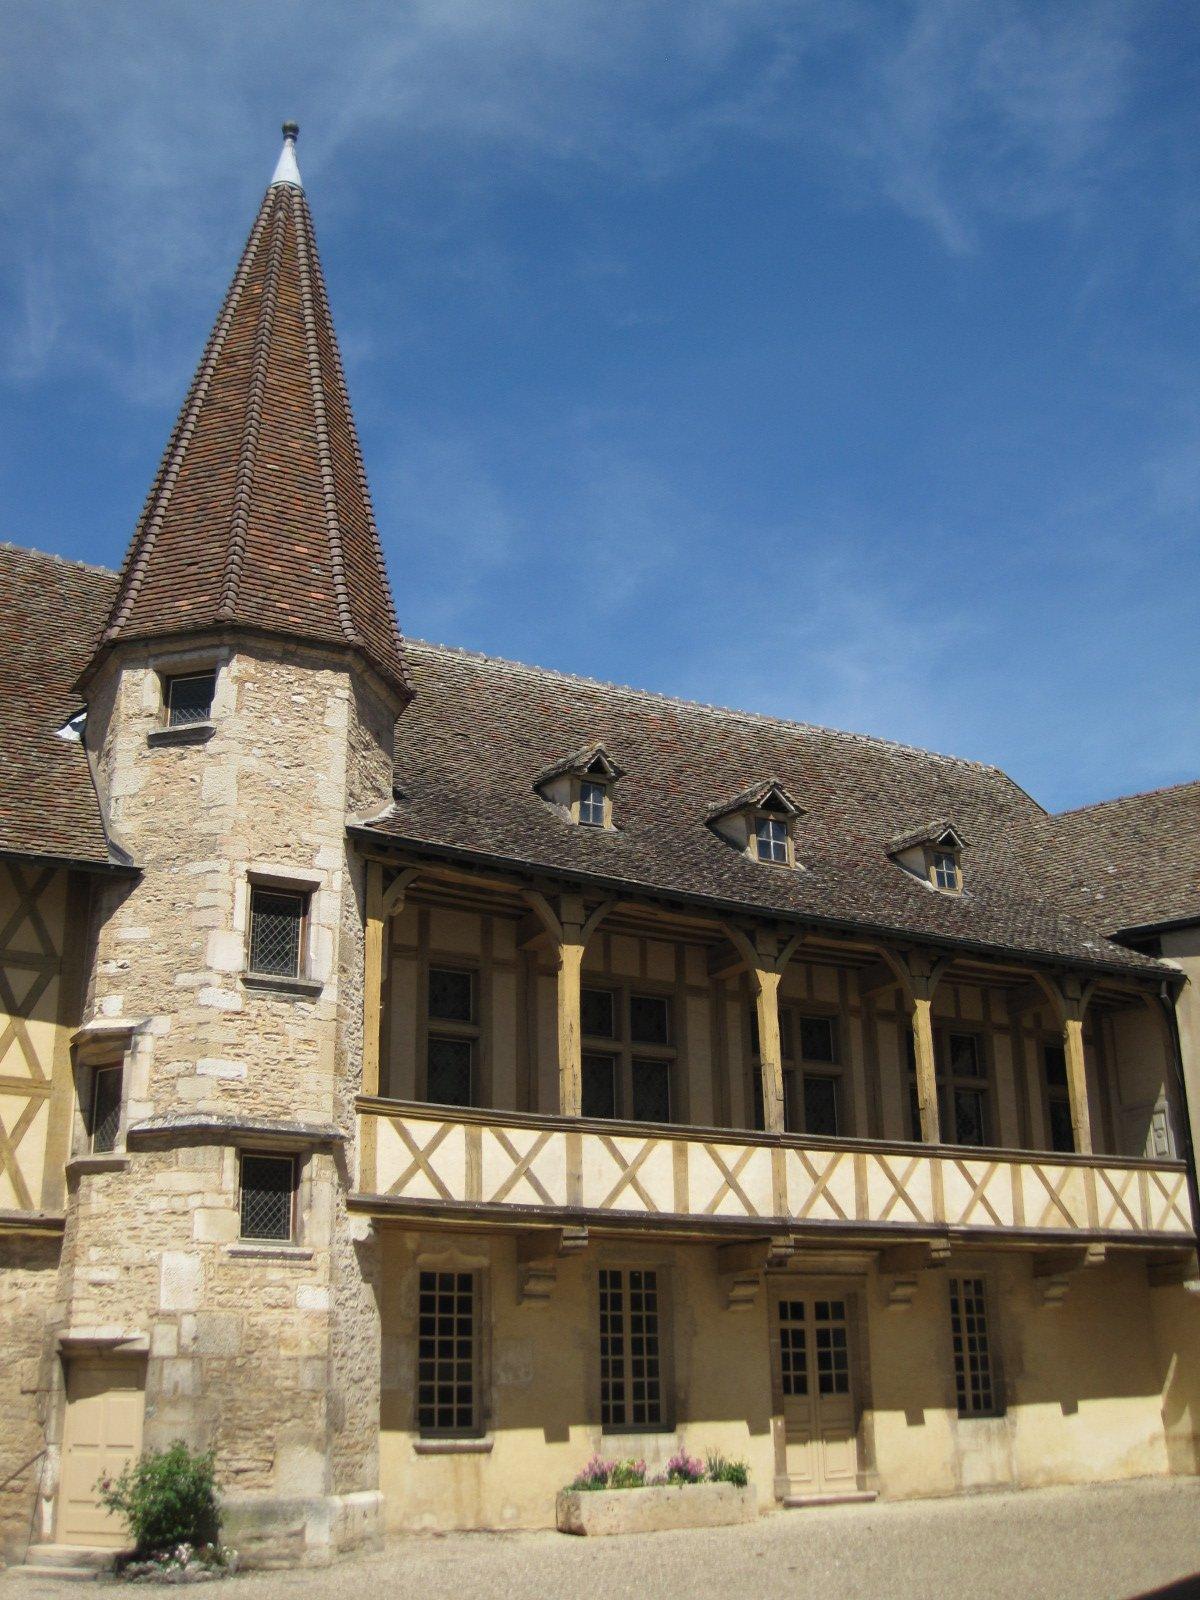 H U00f4tel Des Ducs De Bourgogne De Beaune  U2014 Wikip U00e9dia